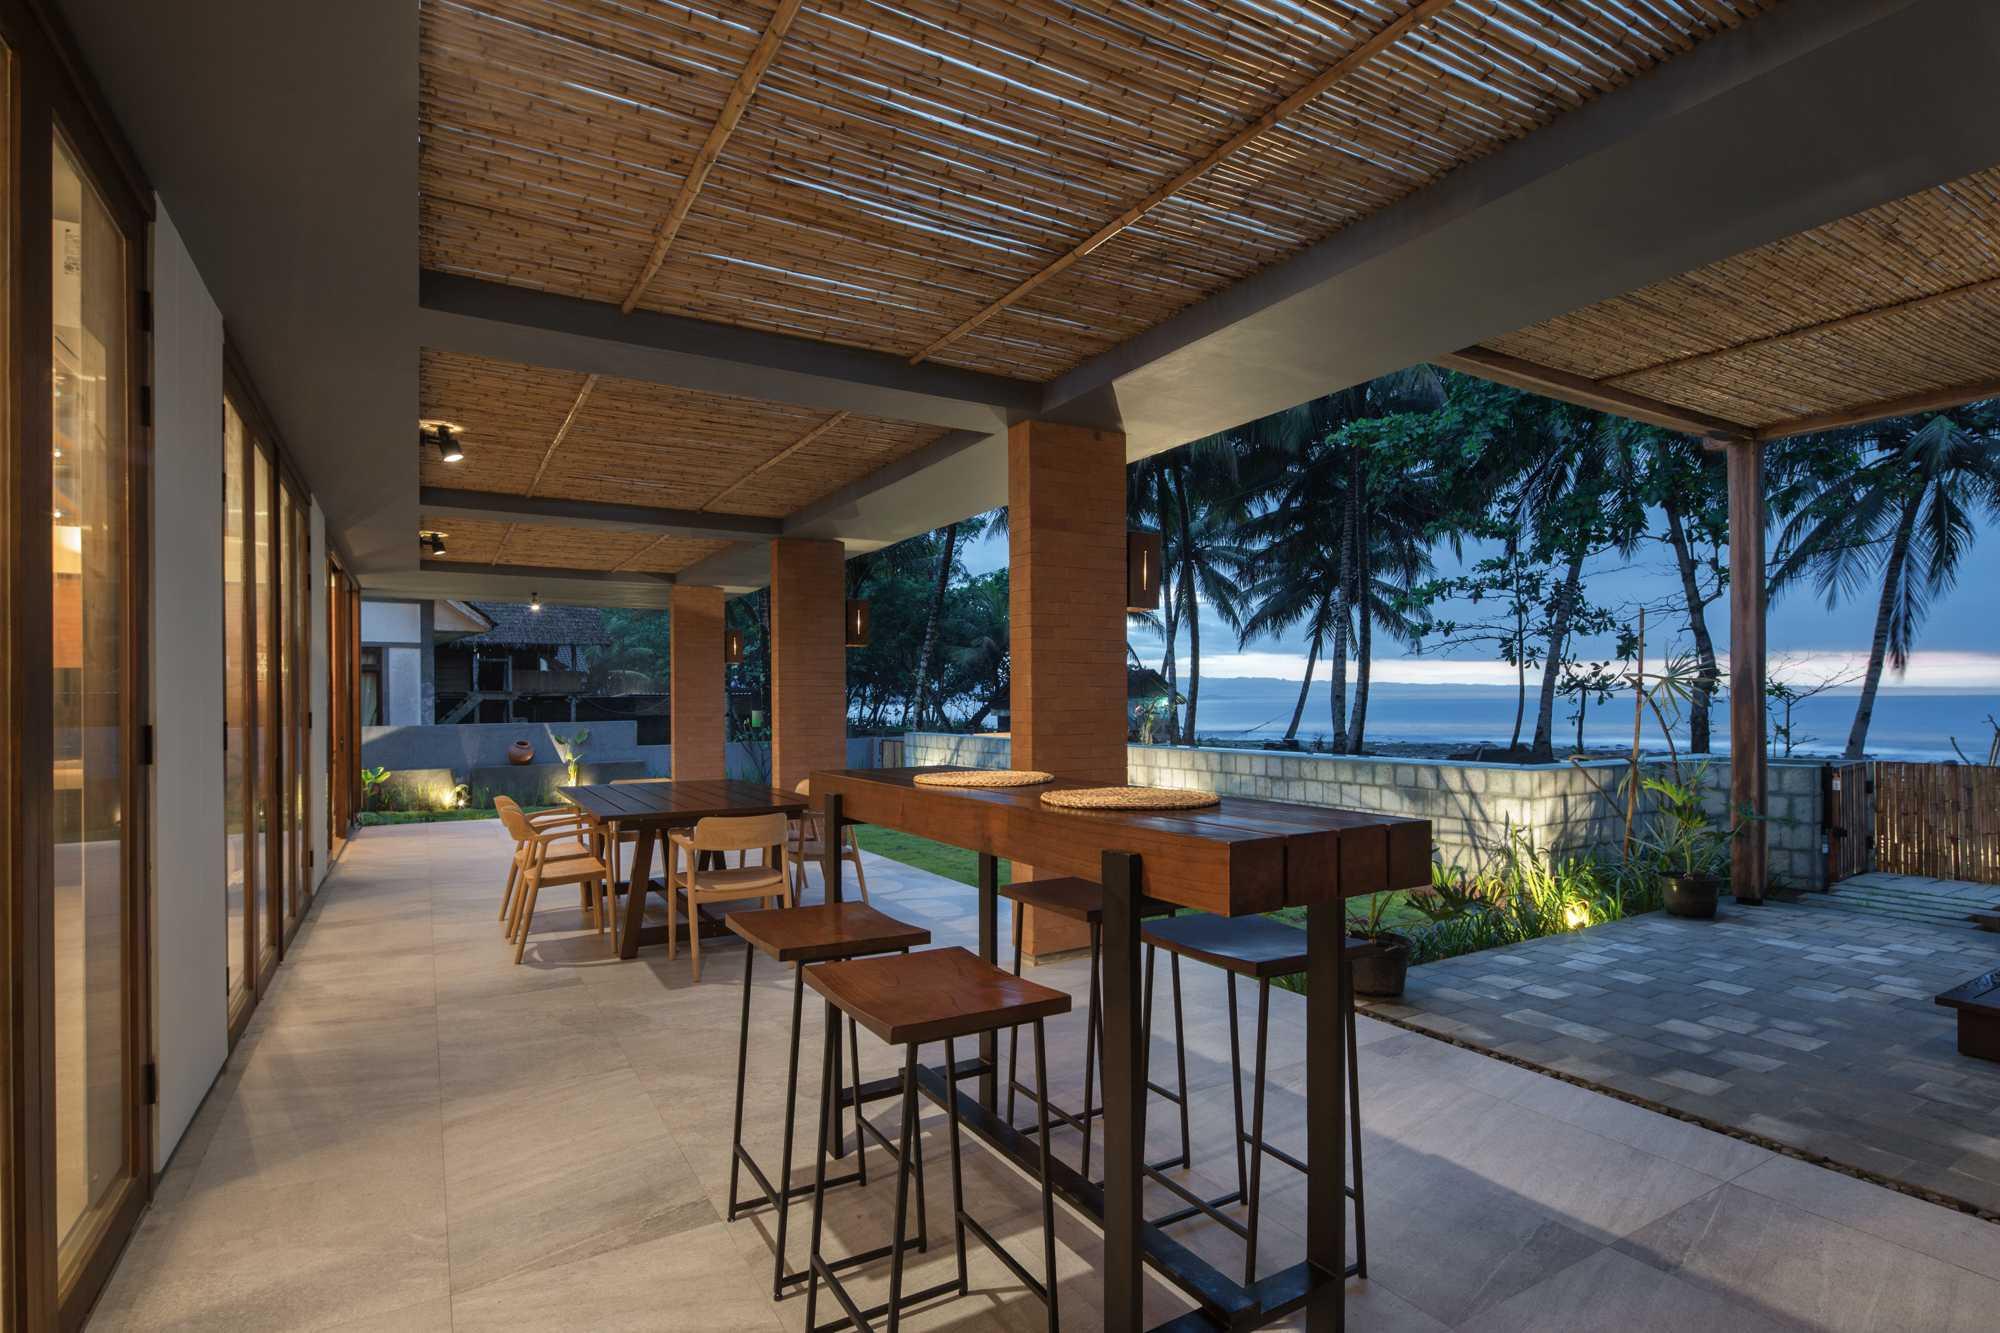 Erwin Kusuma Batu Karas Villa Batukaras Beach, West Java, Indonesia Batukaras Beach, West Java, Indonesia Erwin-Kusuma-Batu-Karas-Villa   64723